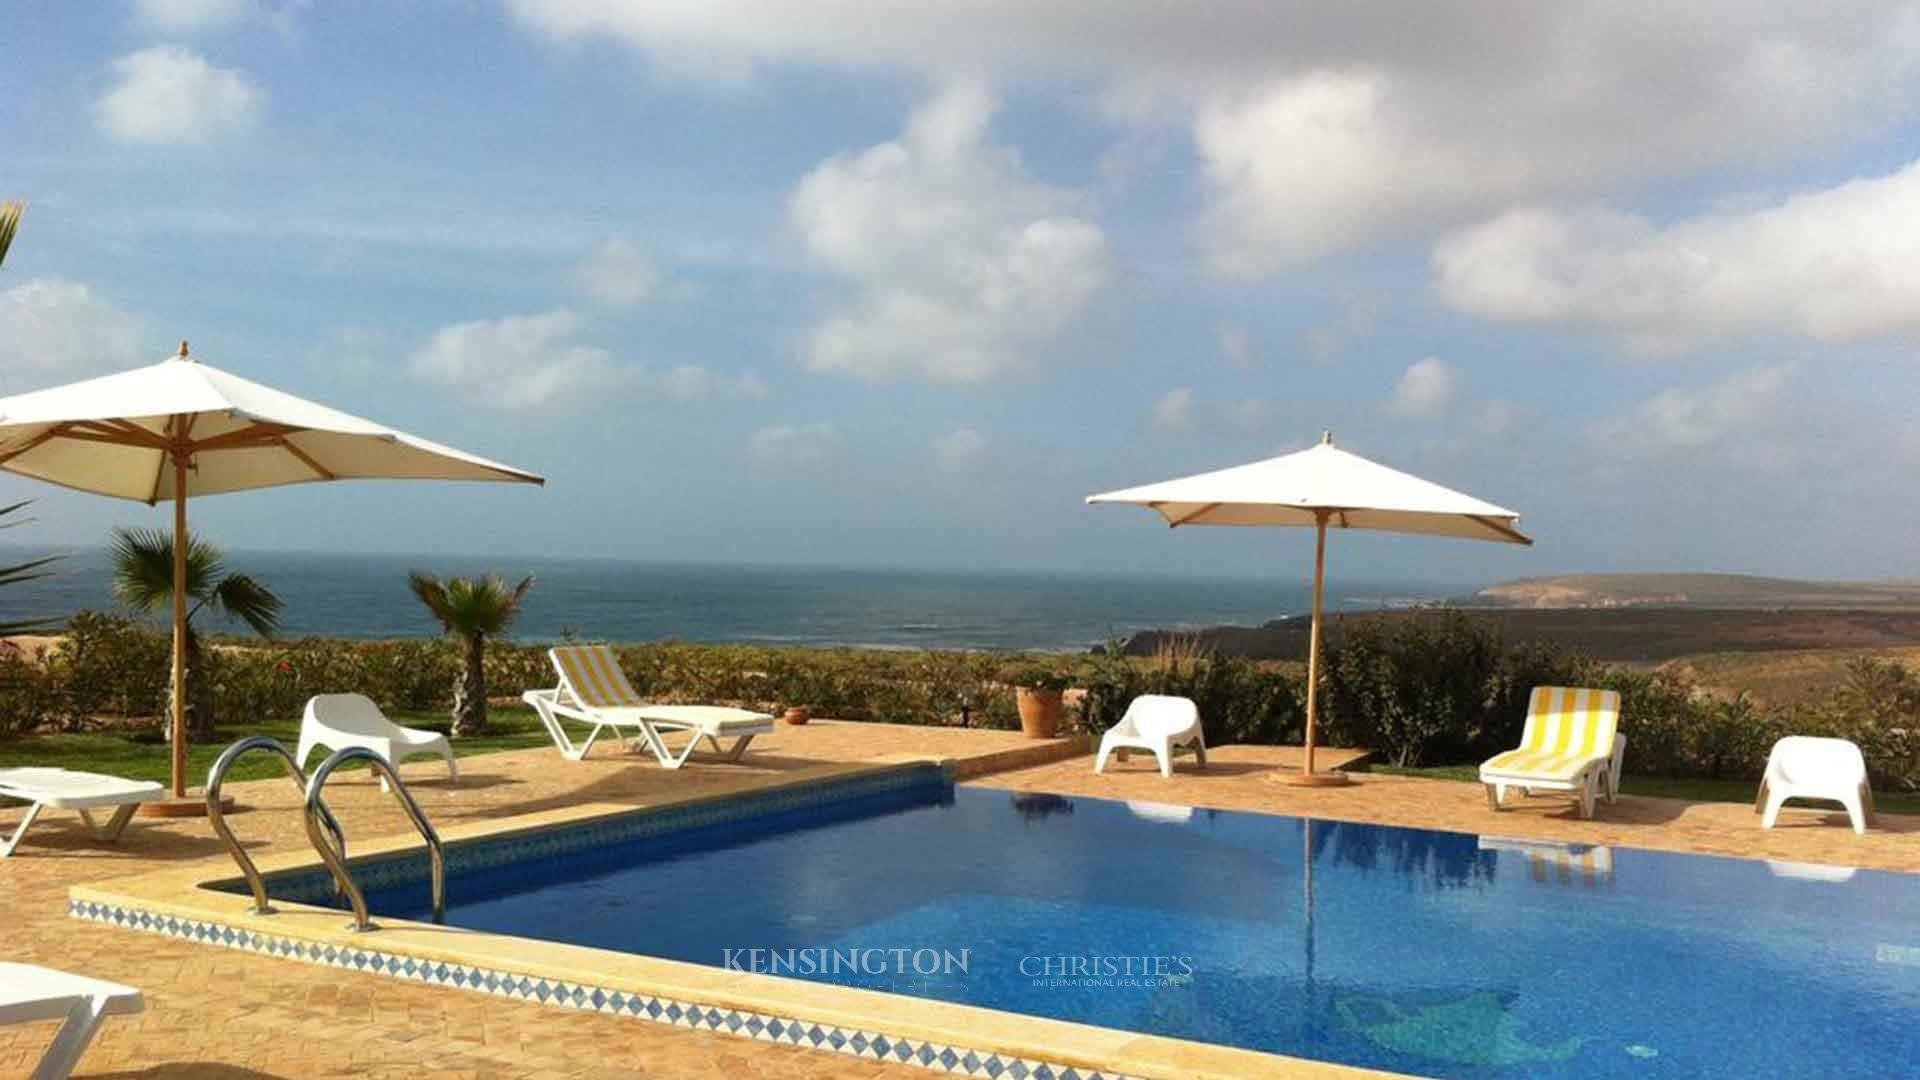 KPPM01318: Villa Atay Villa de luxe Mirleft Maroc